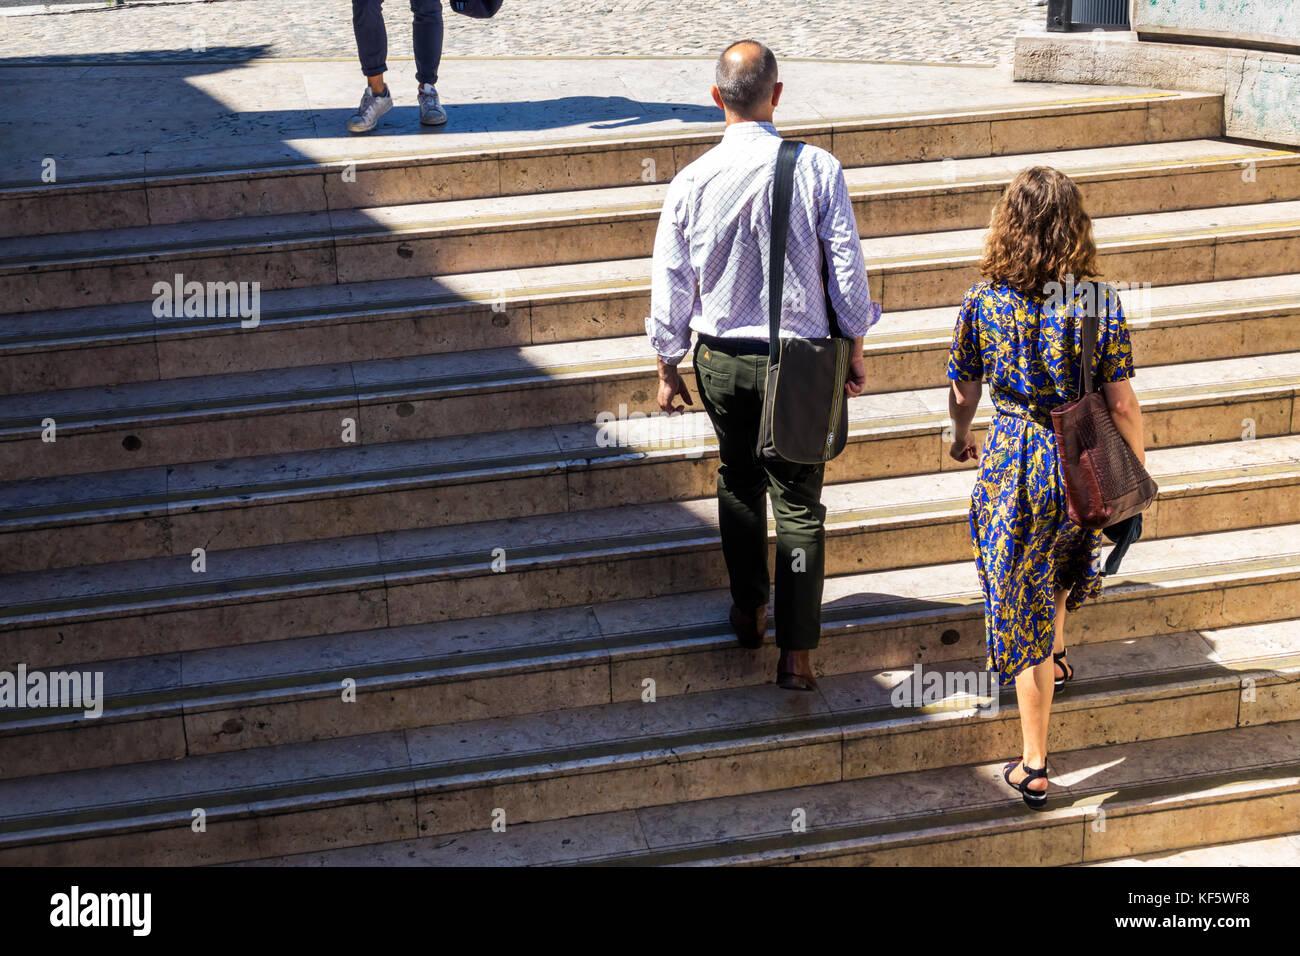 Lisbon Portugal Praca Marques de Pombal Metro Lisboa subway station stairs exterior man woman commuter ascending - Stock Image